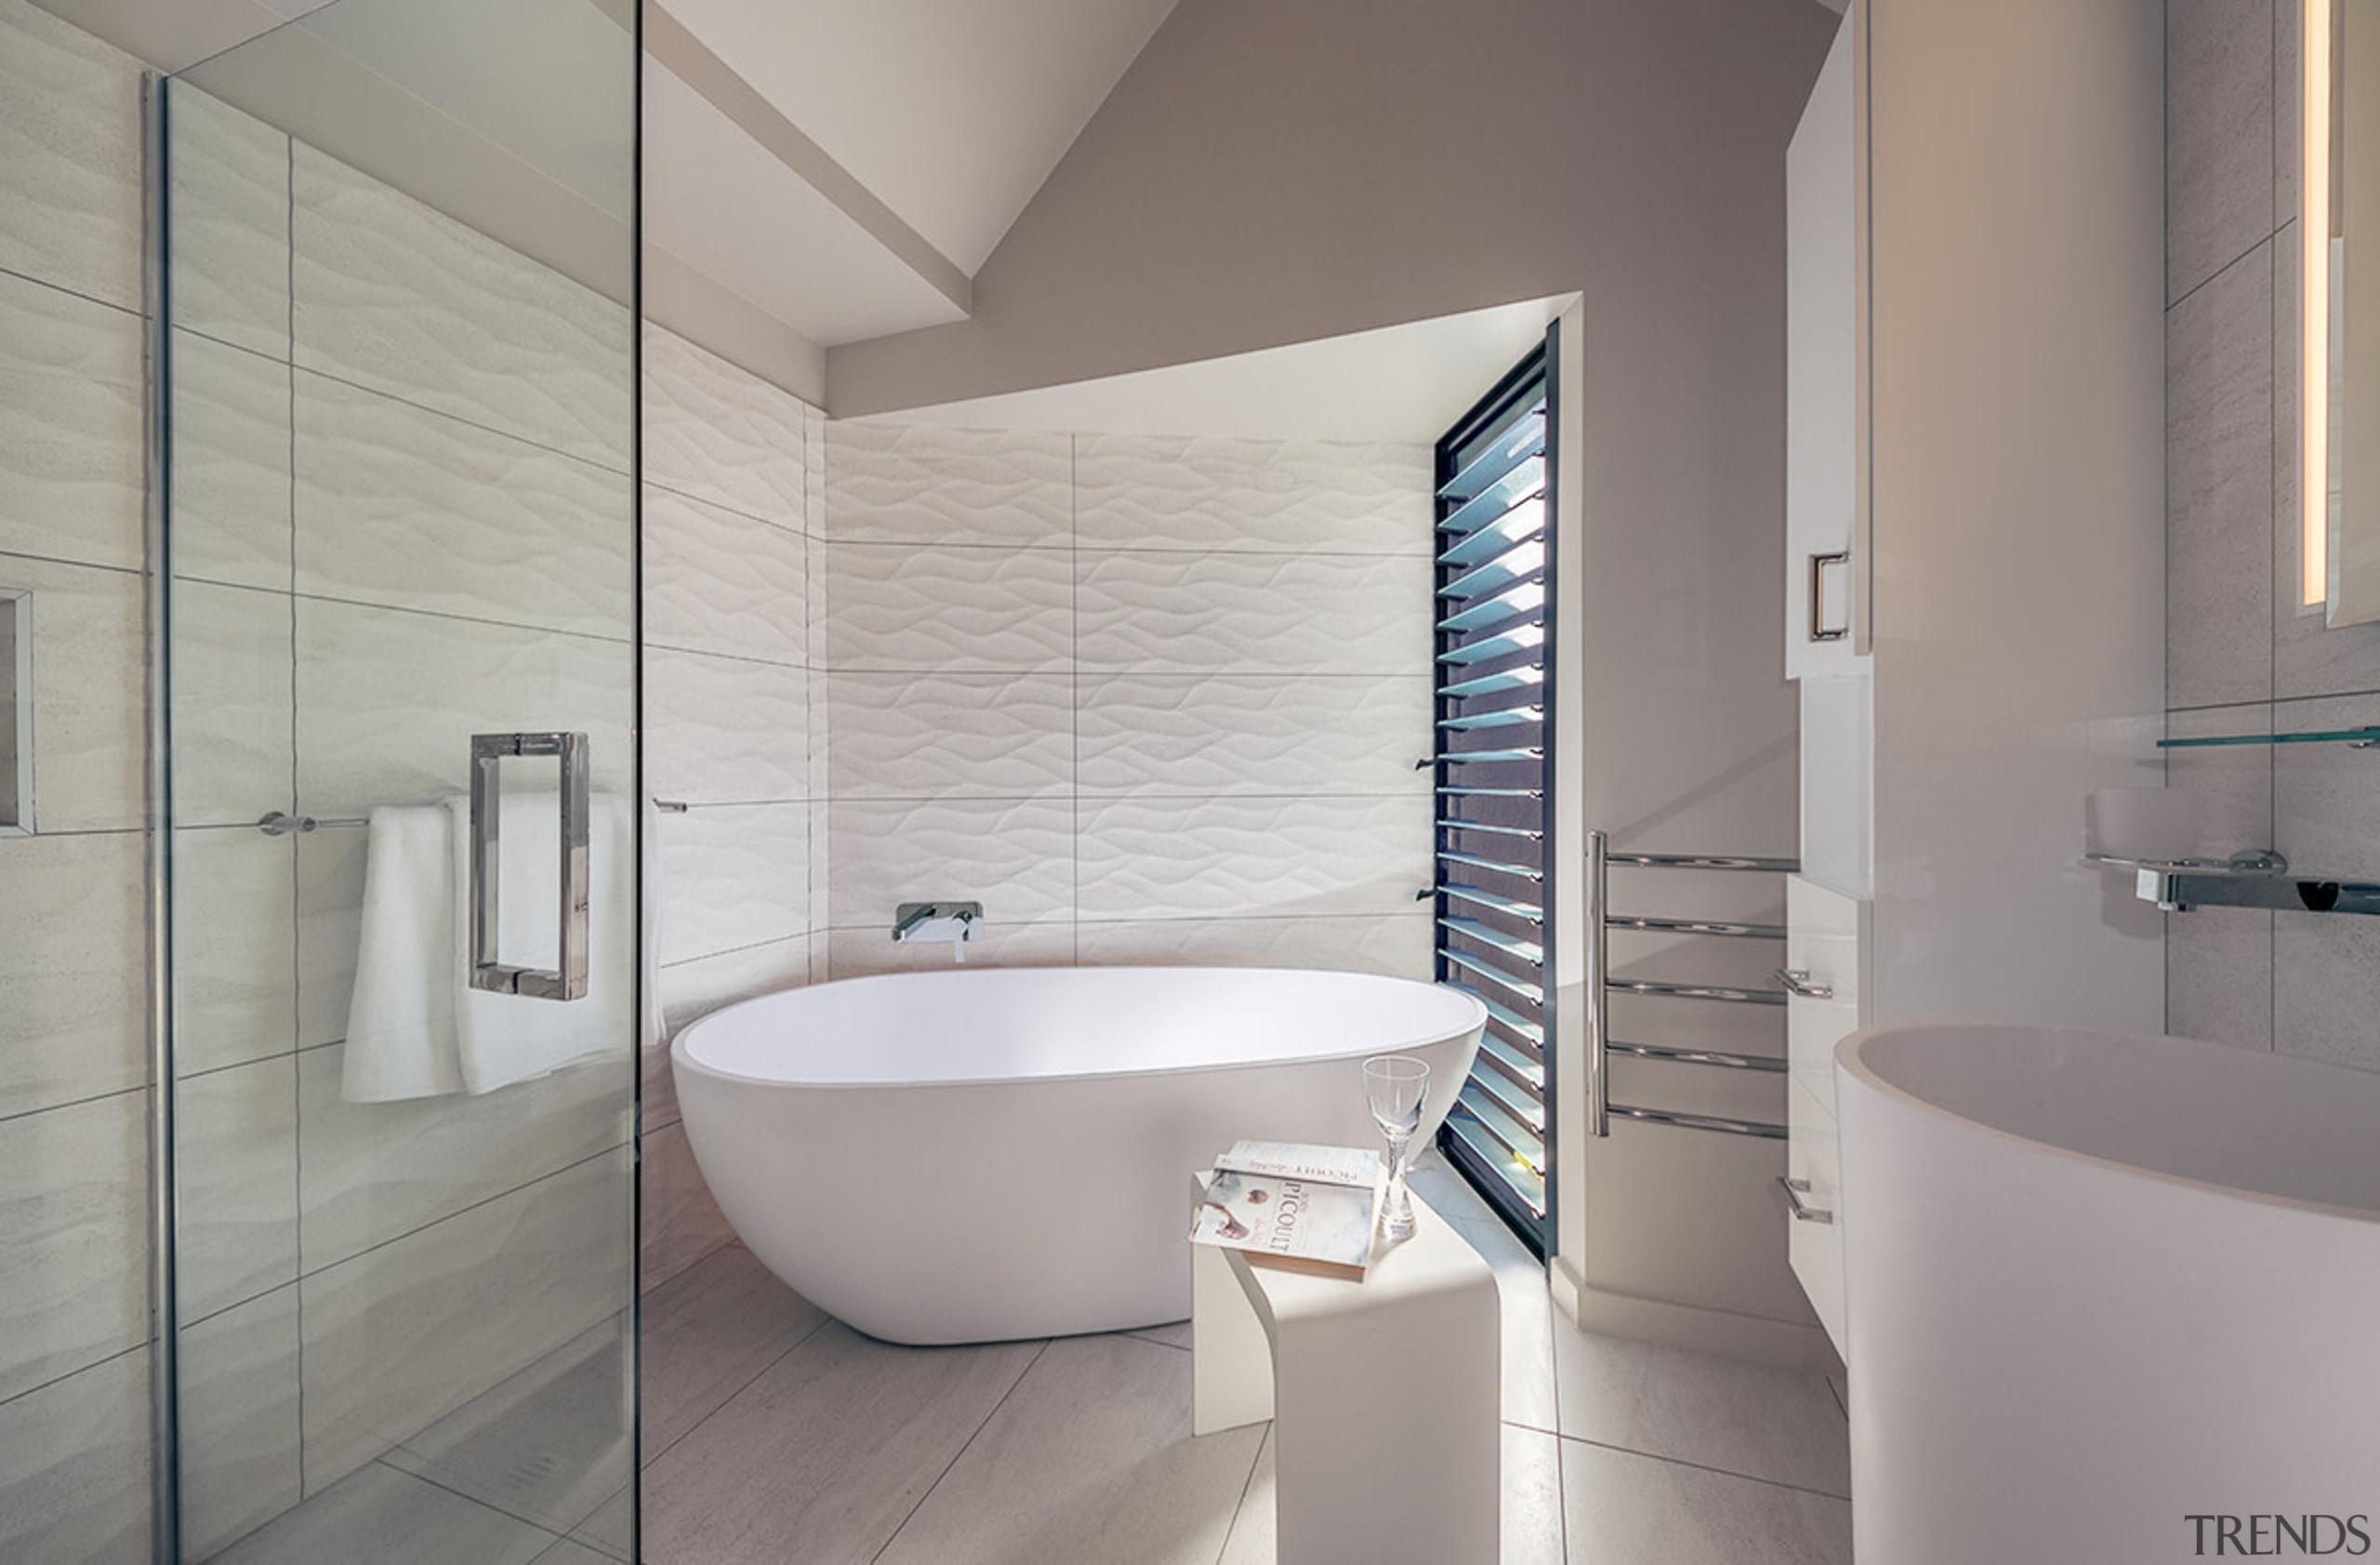 Extending the length of the existing bathroom provided architecture, bathroom, bathroom accessory, bidet, floor, interior design, plumbing fixture, room, tap, tile, toilet seat, gray